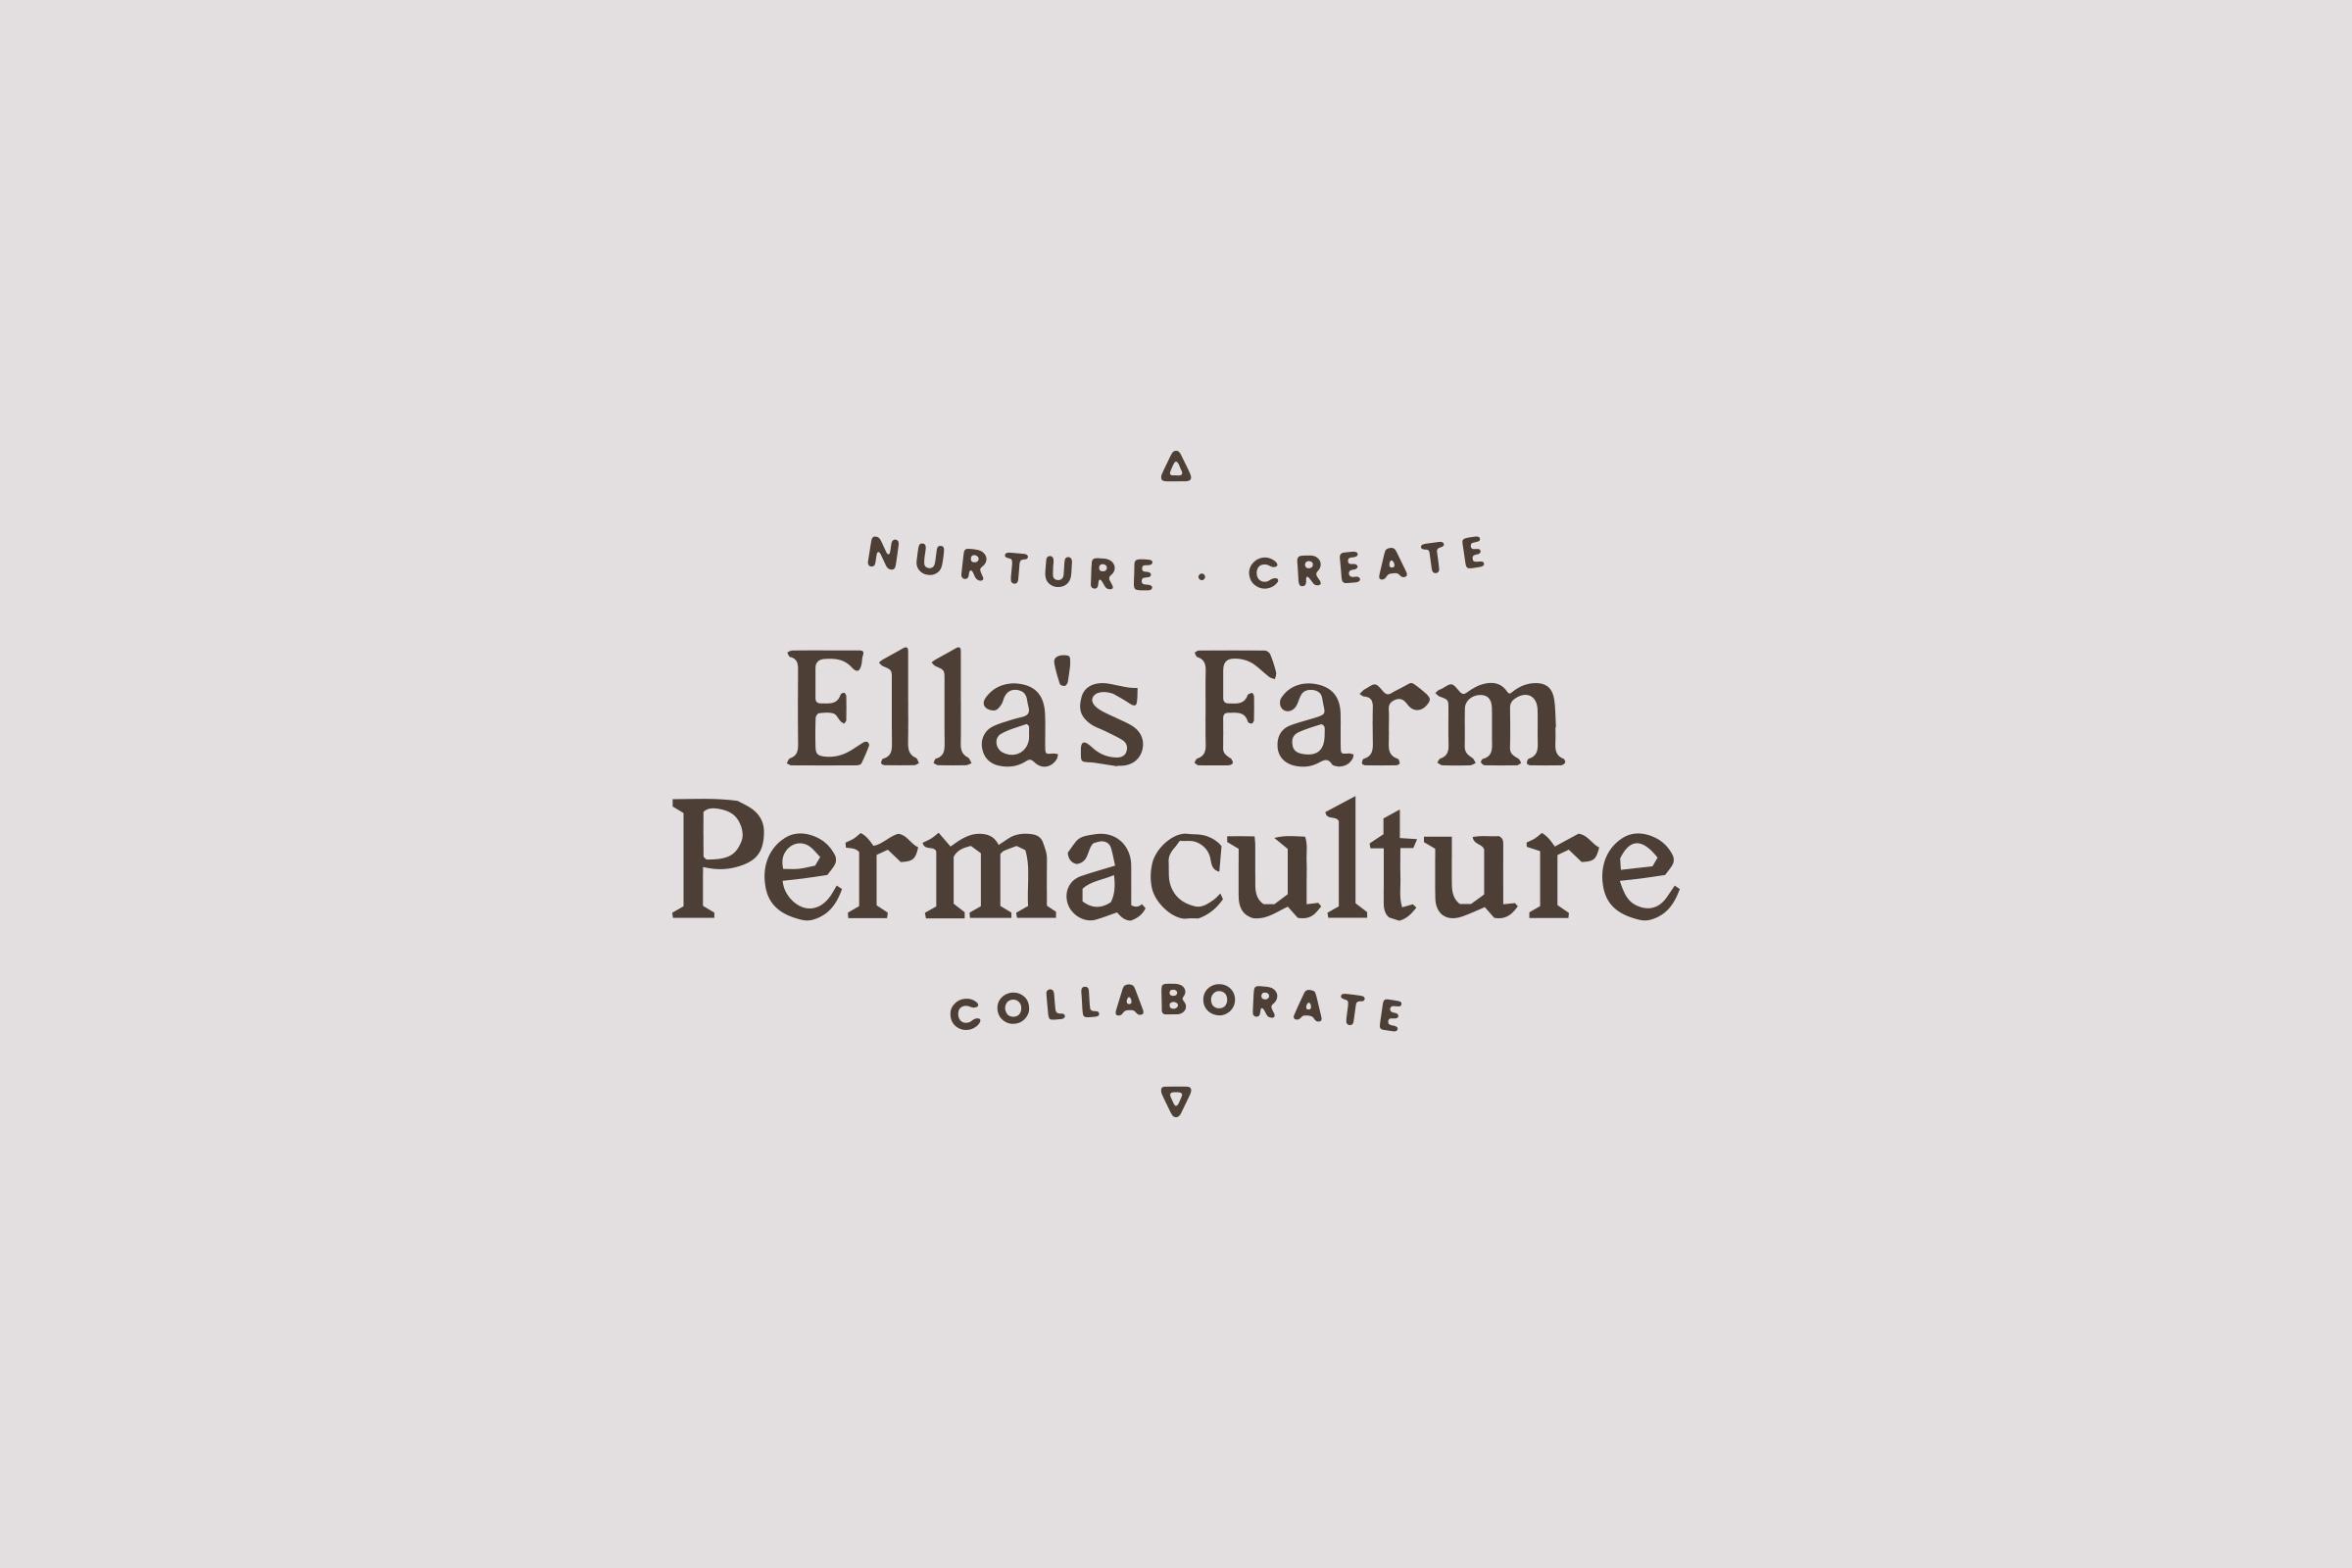 00_Ella'sFarm_Branding_by_Foster_Creative.jpg